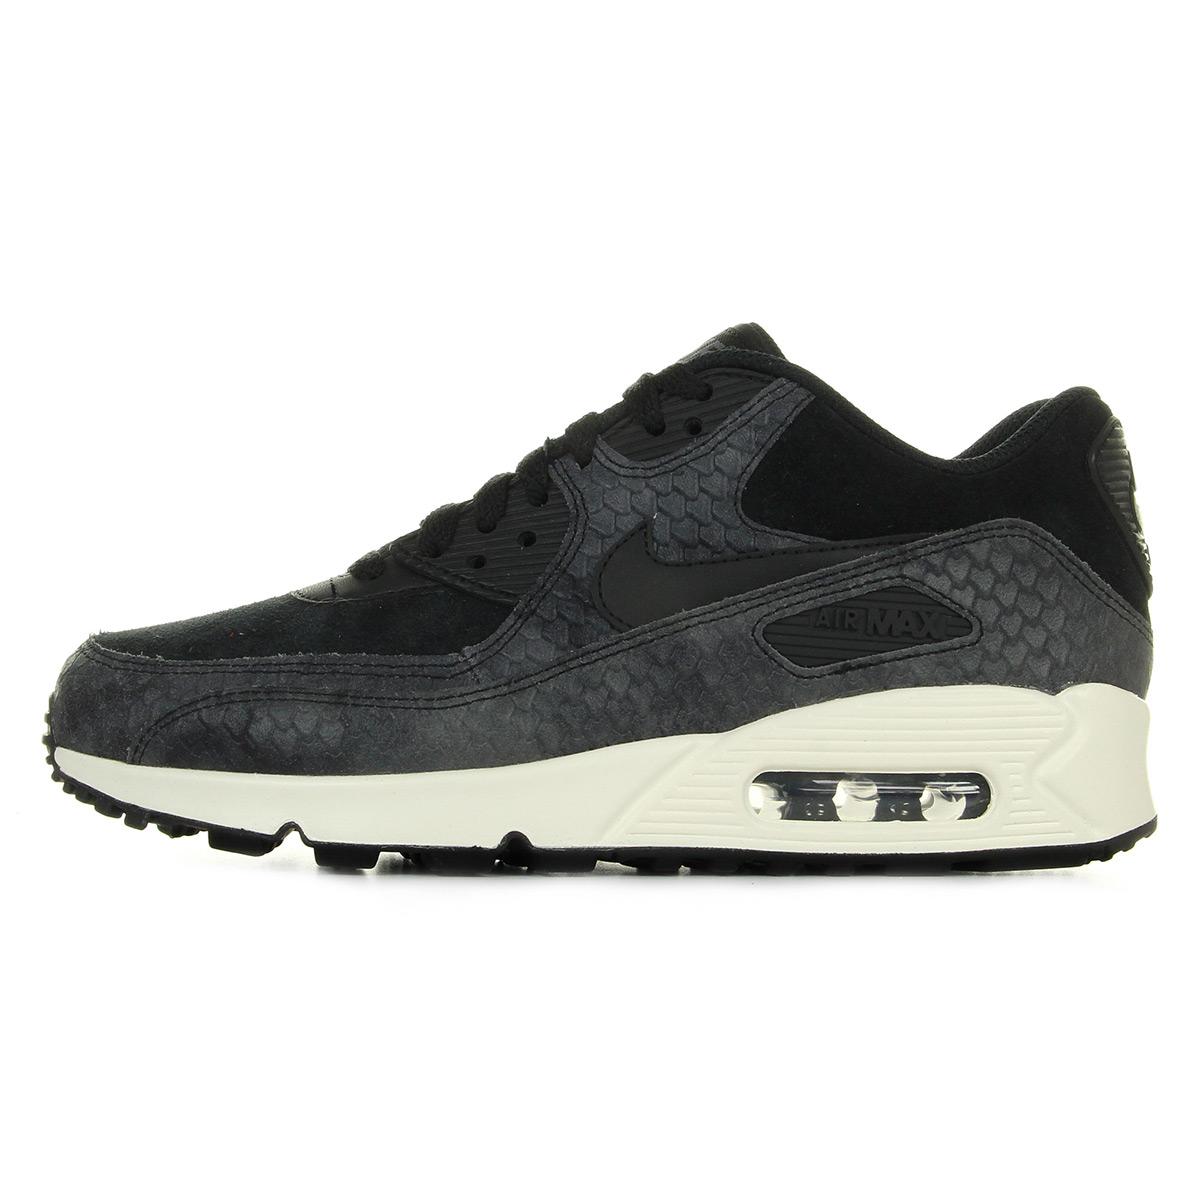 Nike Air Max 90 Prm 896497005, Baskets mode femme